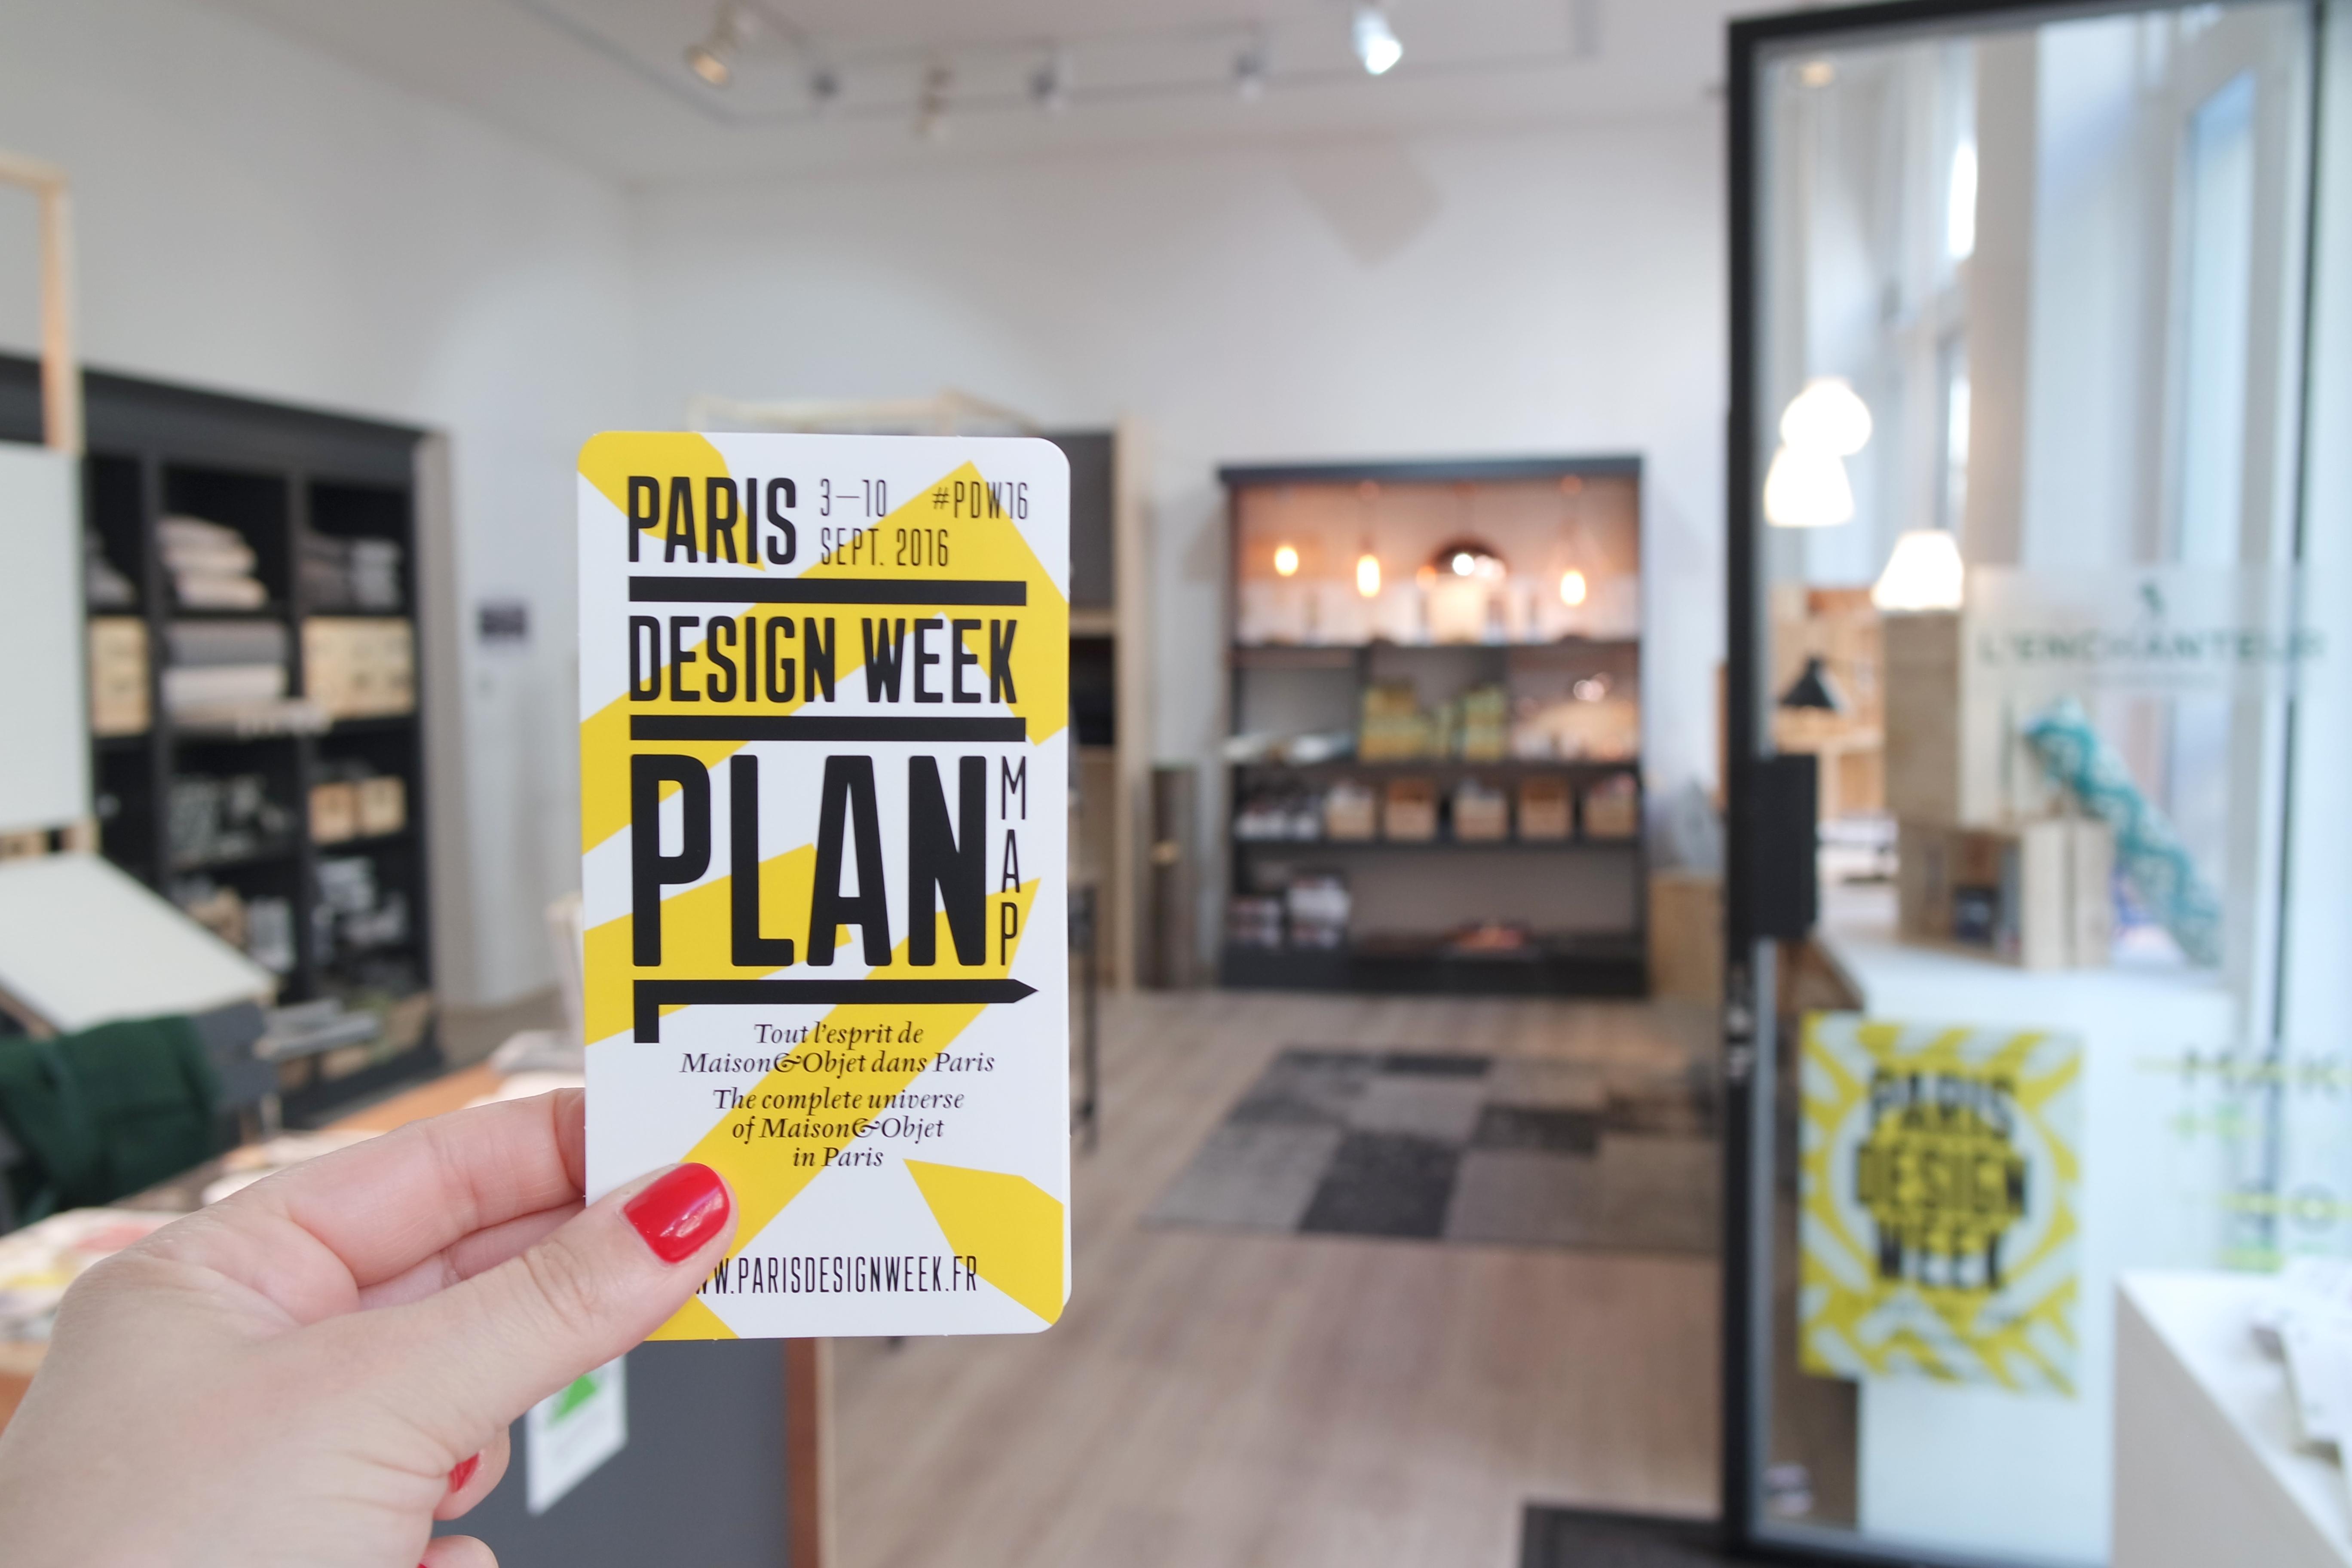 Paris Design Week Celest-in.fr